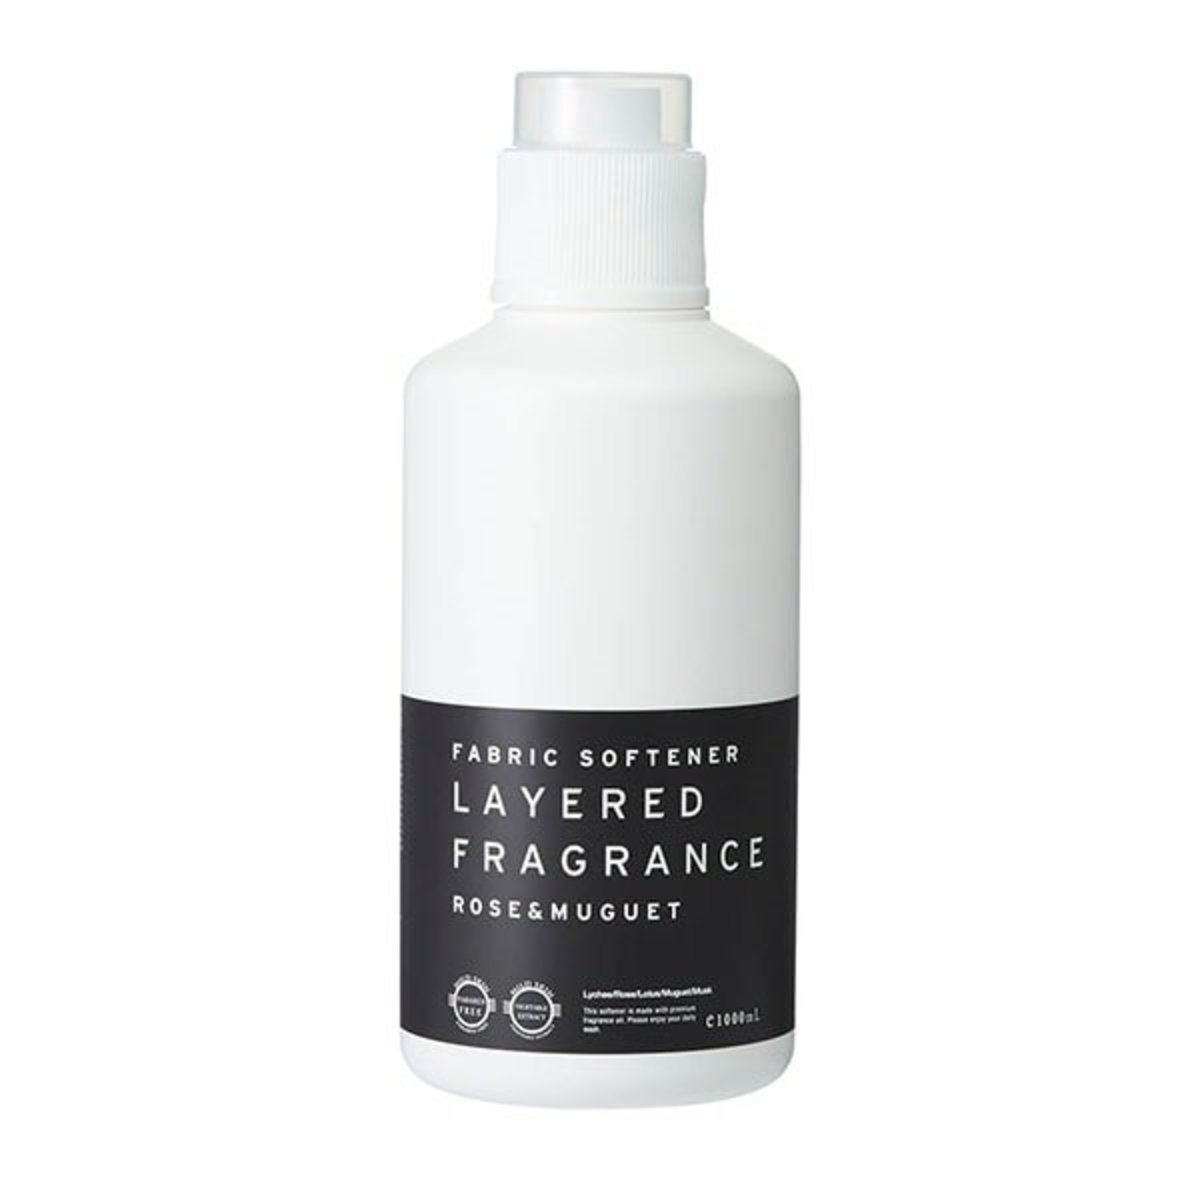 Layered F. Fabric Softener - Rose & Muguet